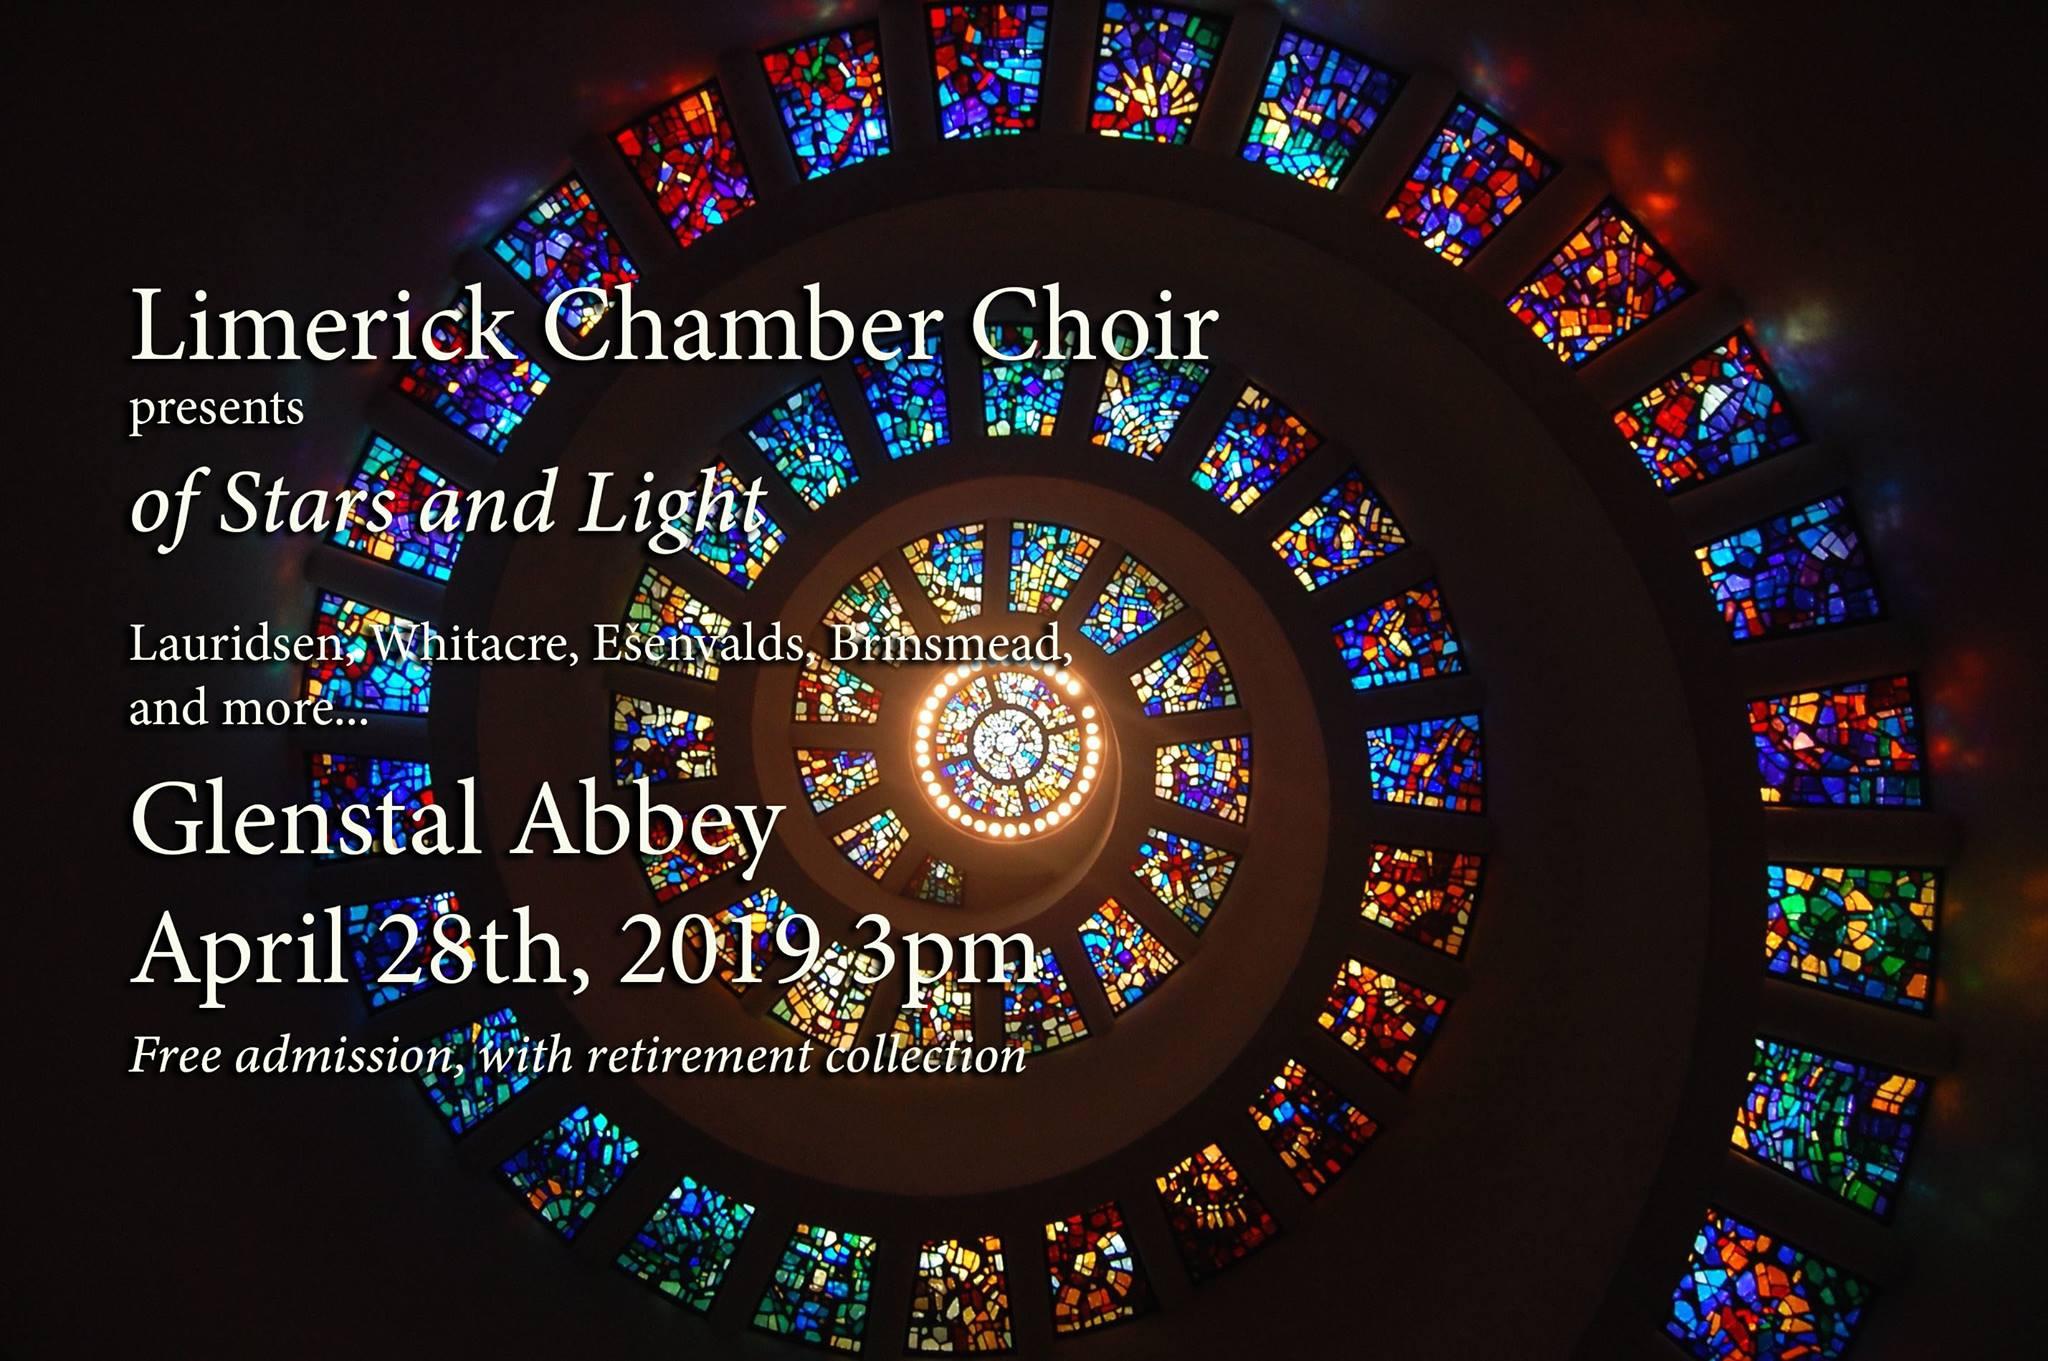 Limerick Chamber Choir perform at Glenstal Abbey